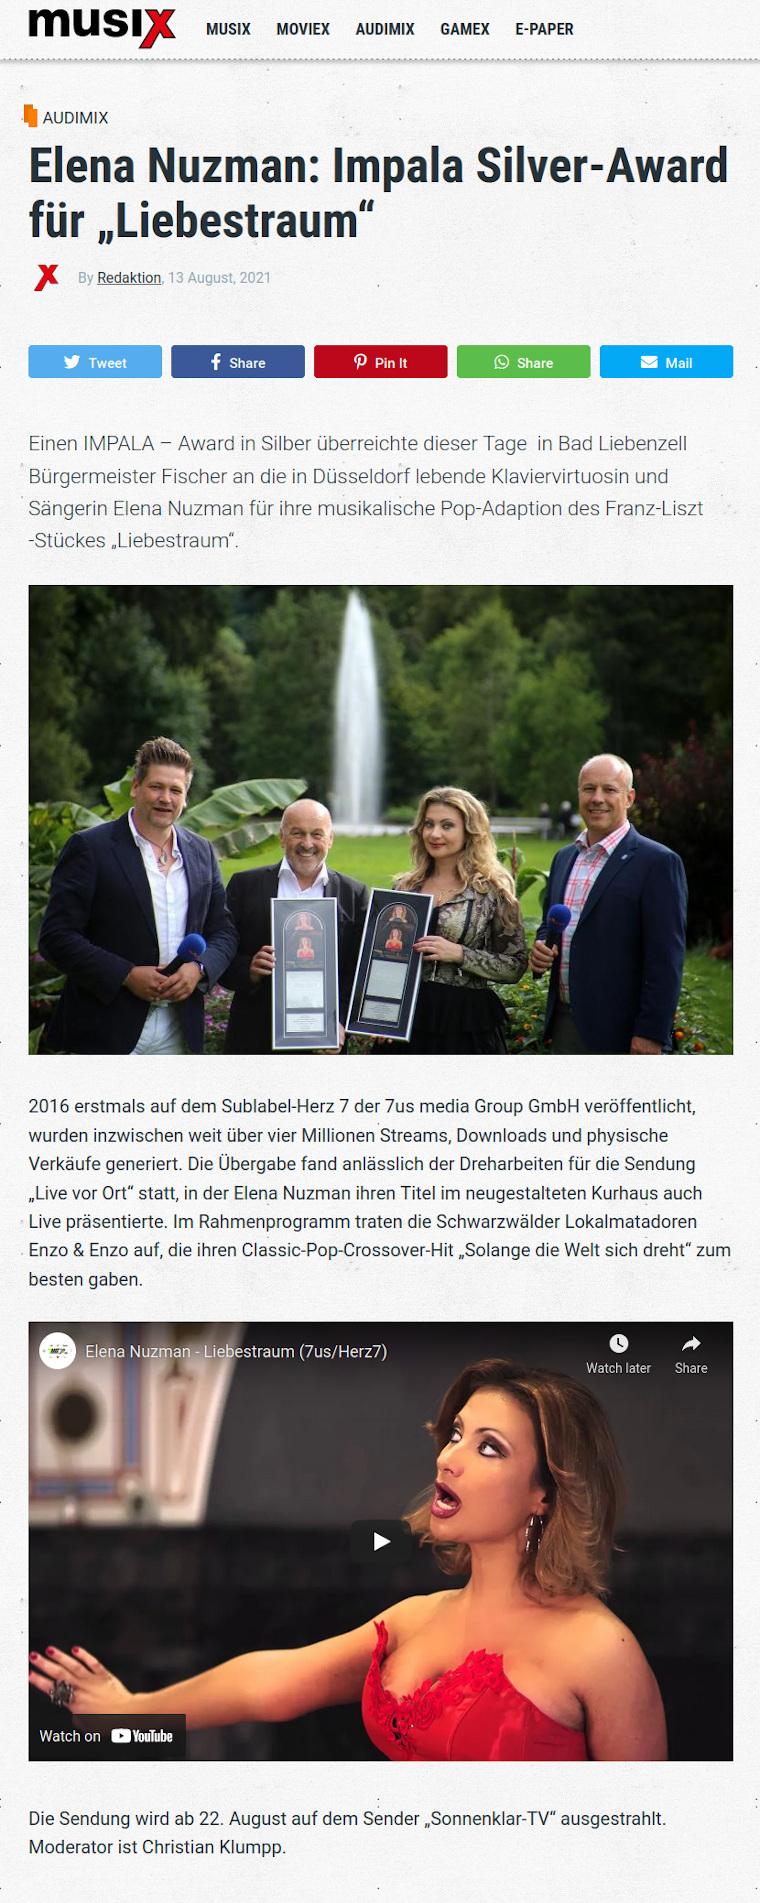 Elena Nuzman - Aktuell - Musix.de - IMPALA Silver-Award - August 2021